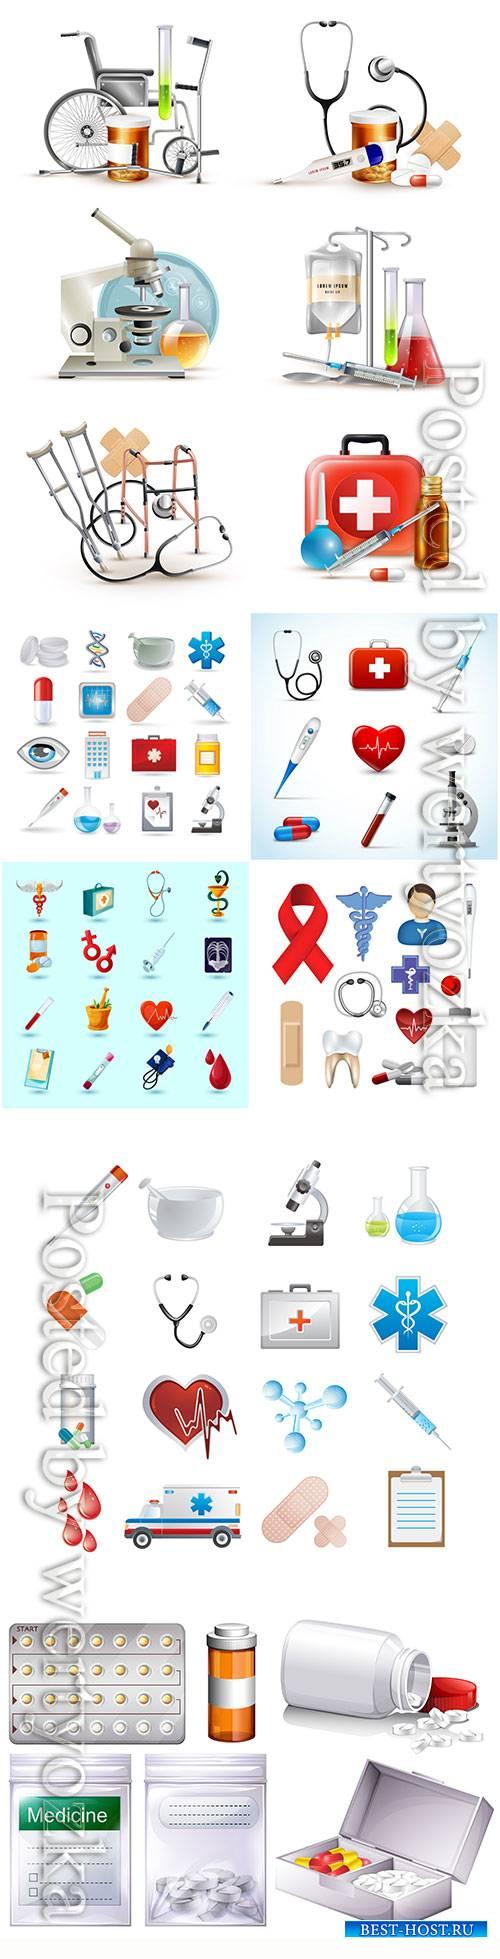 Medical supply elements vector set